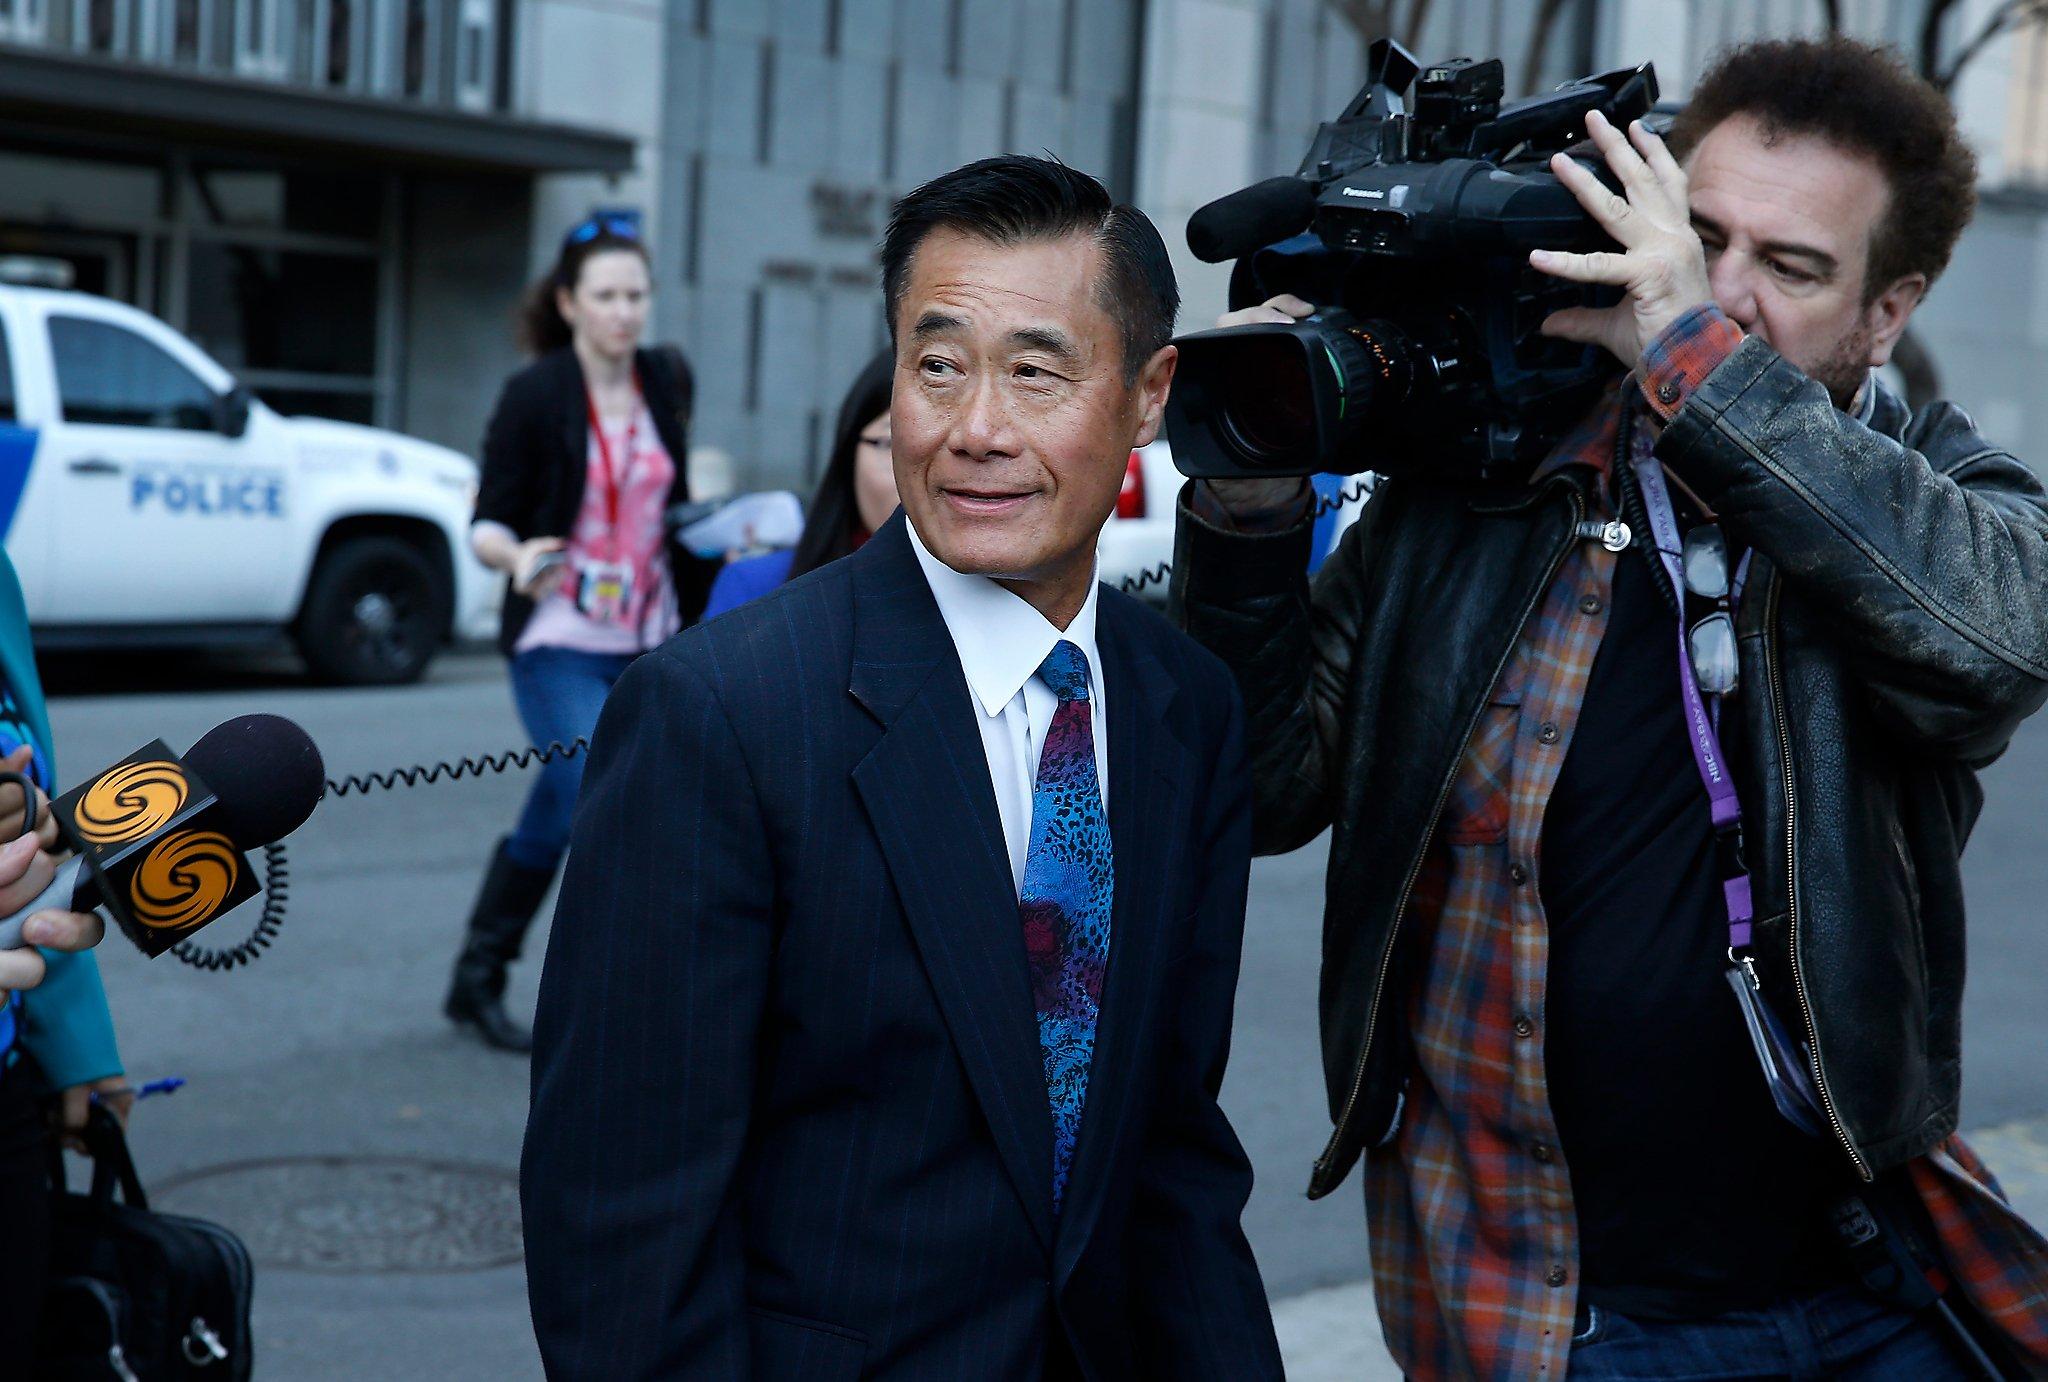 Former state Sen. Leland Yee, ex-SF school board chief sentenced